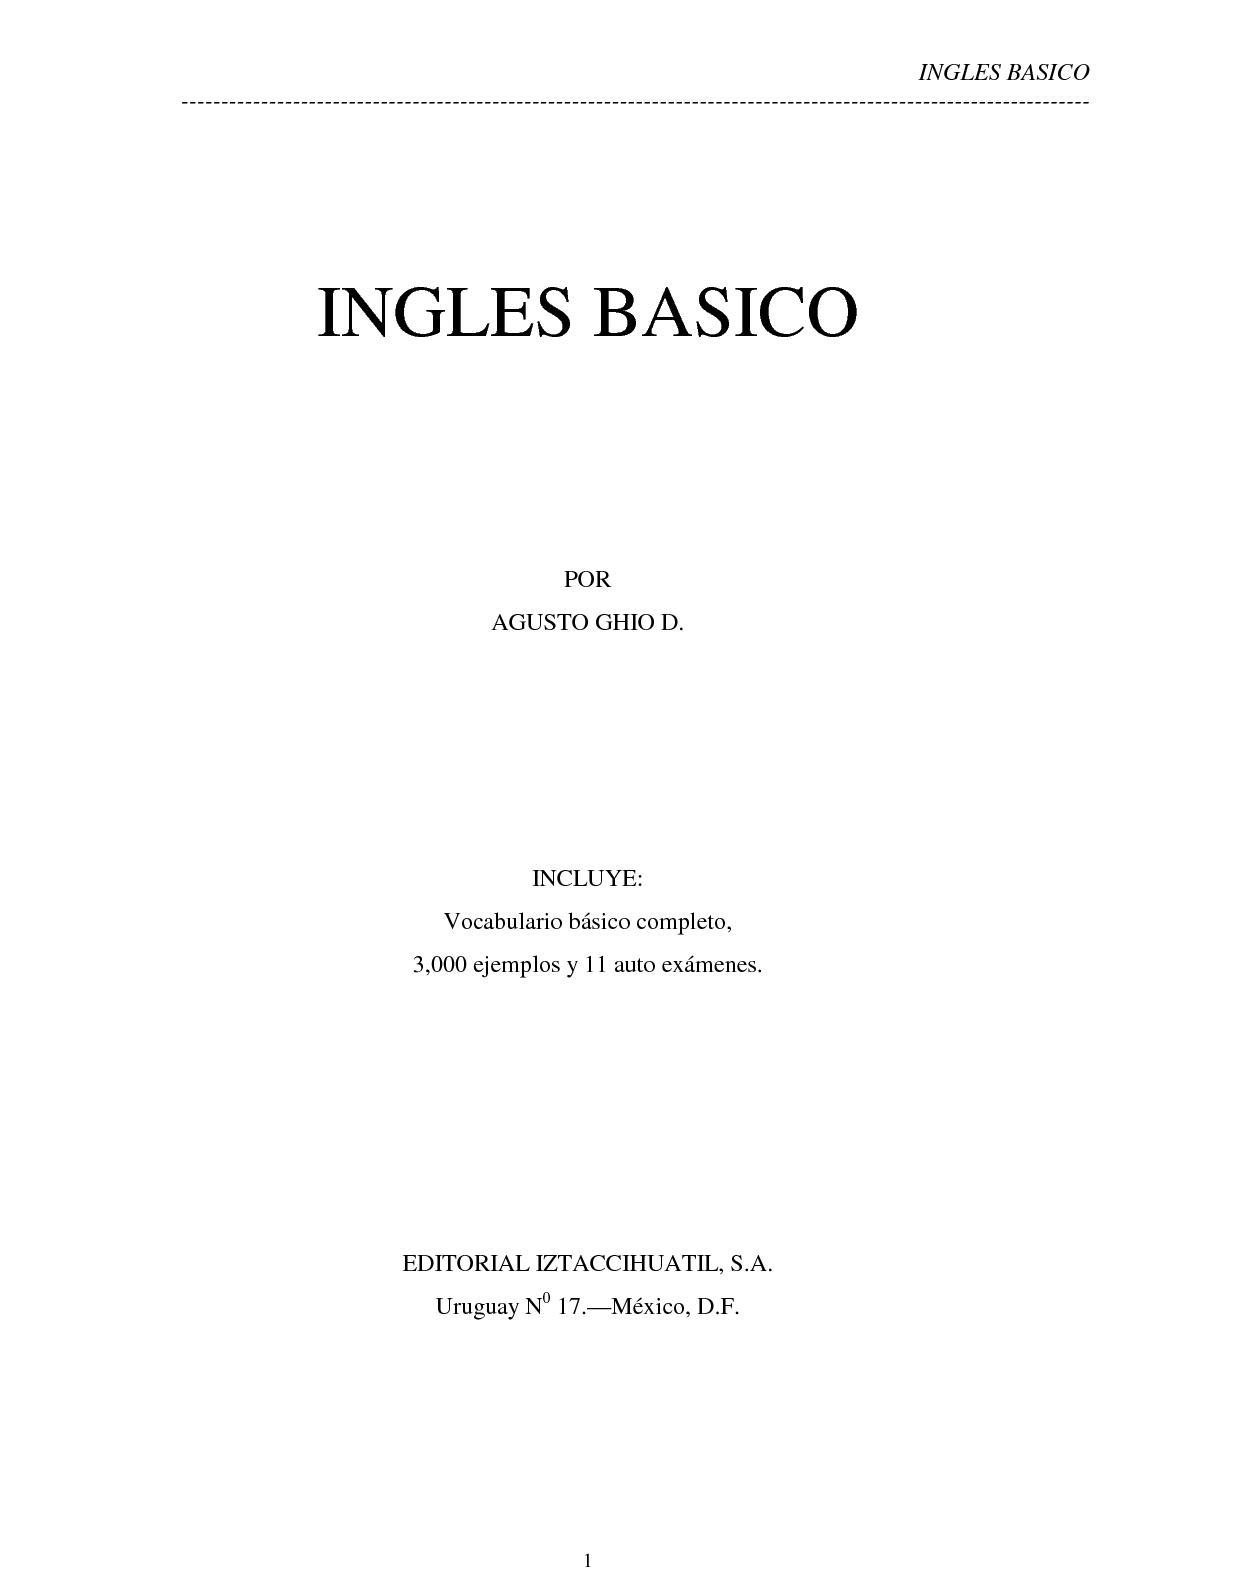 Ingles Basico Augusto Ghio Epub